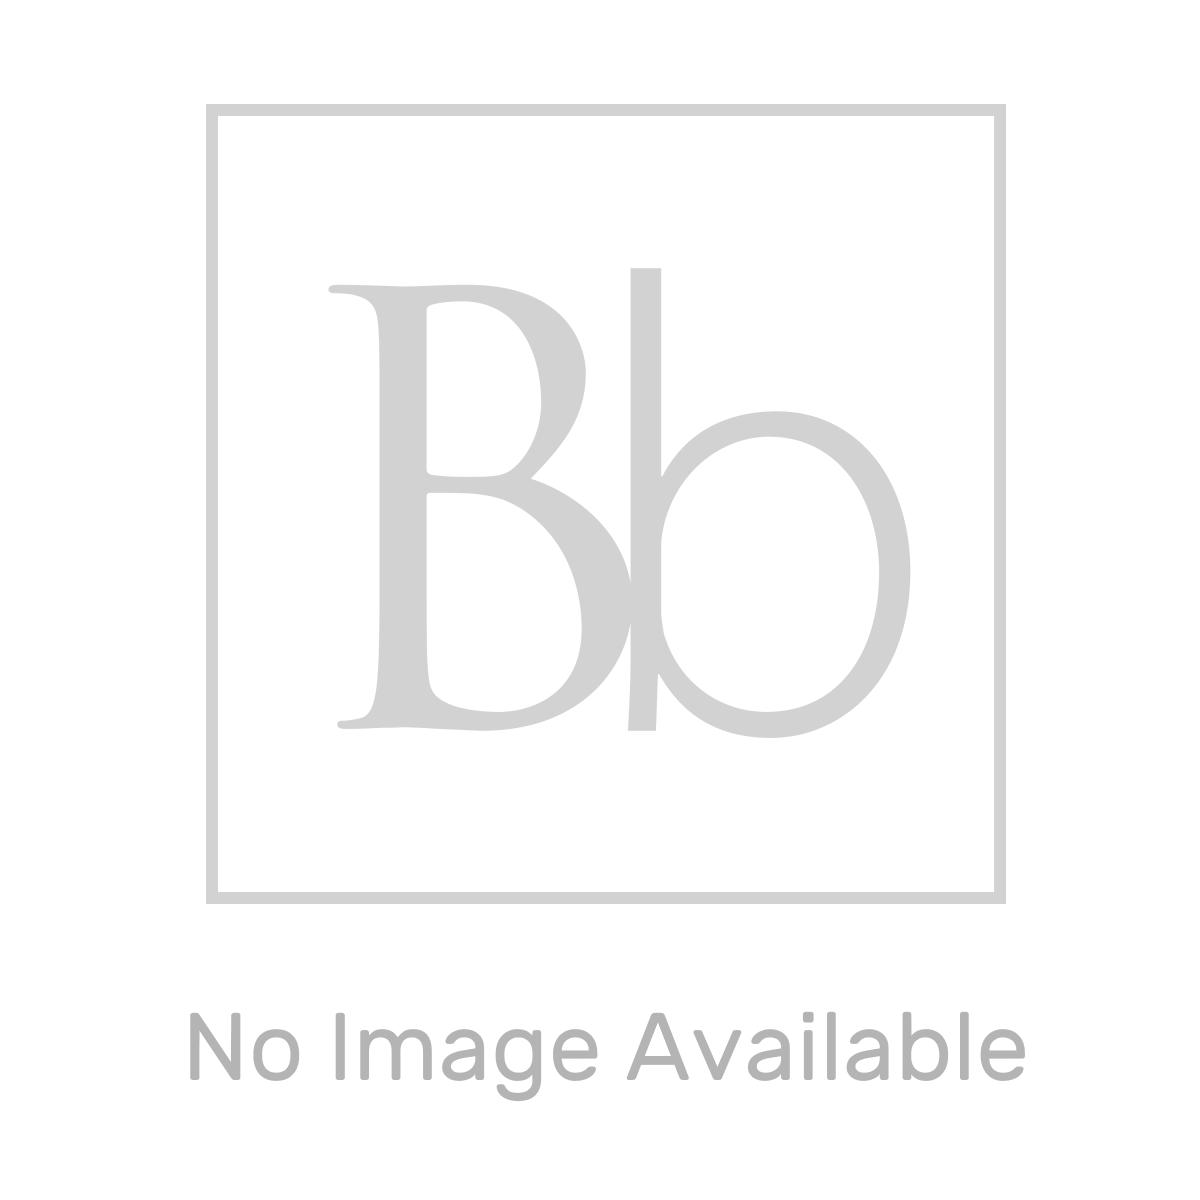 Aquadart Black Slate Shower Tray 1200 x 700 Dimension